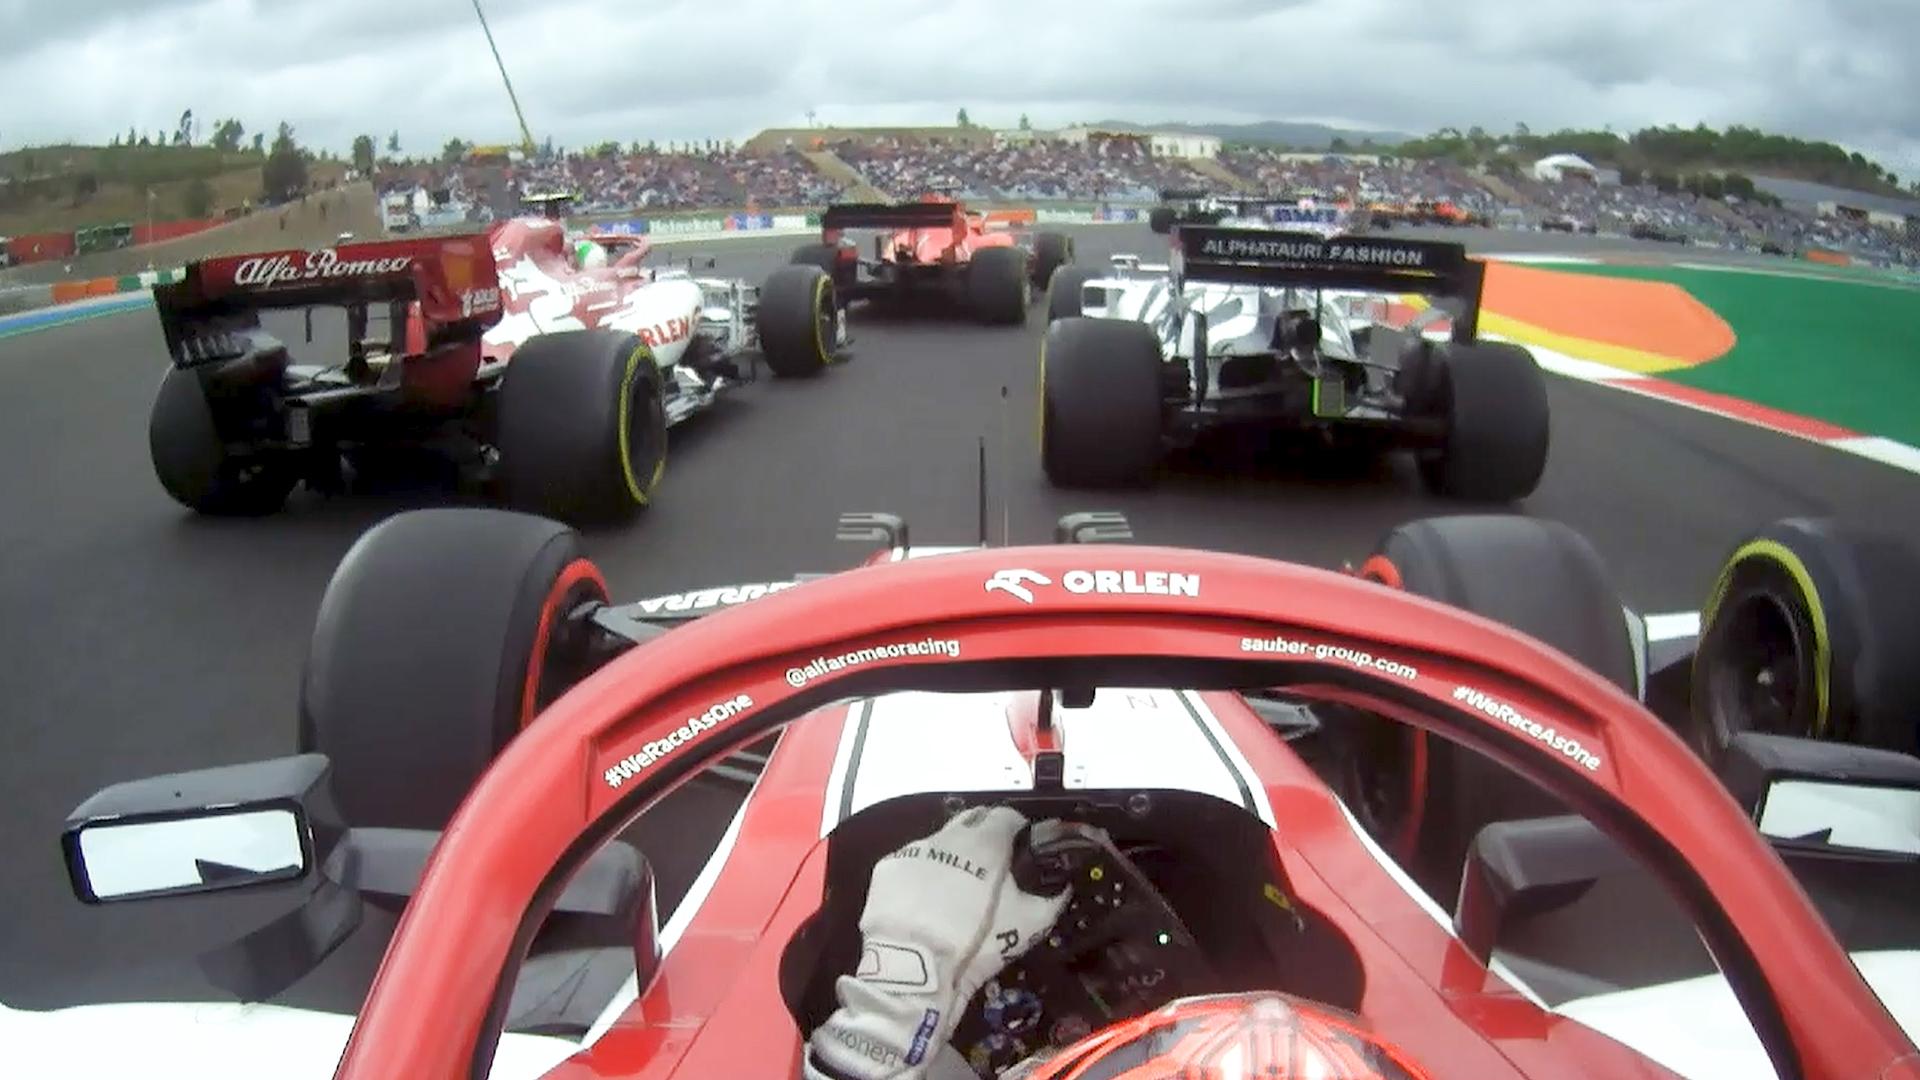 2020 Portuguese Grand Prix: Raikkonen makes up 10 places with incredible start